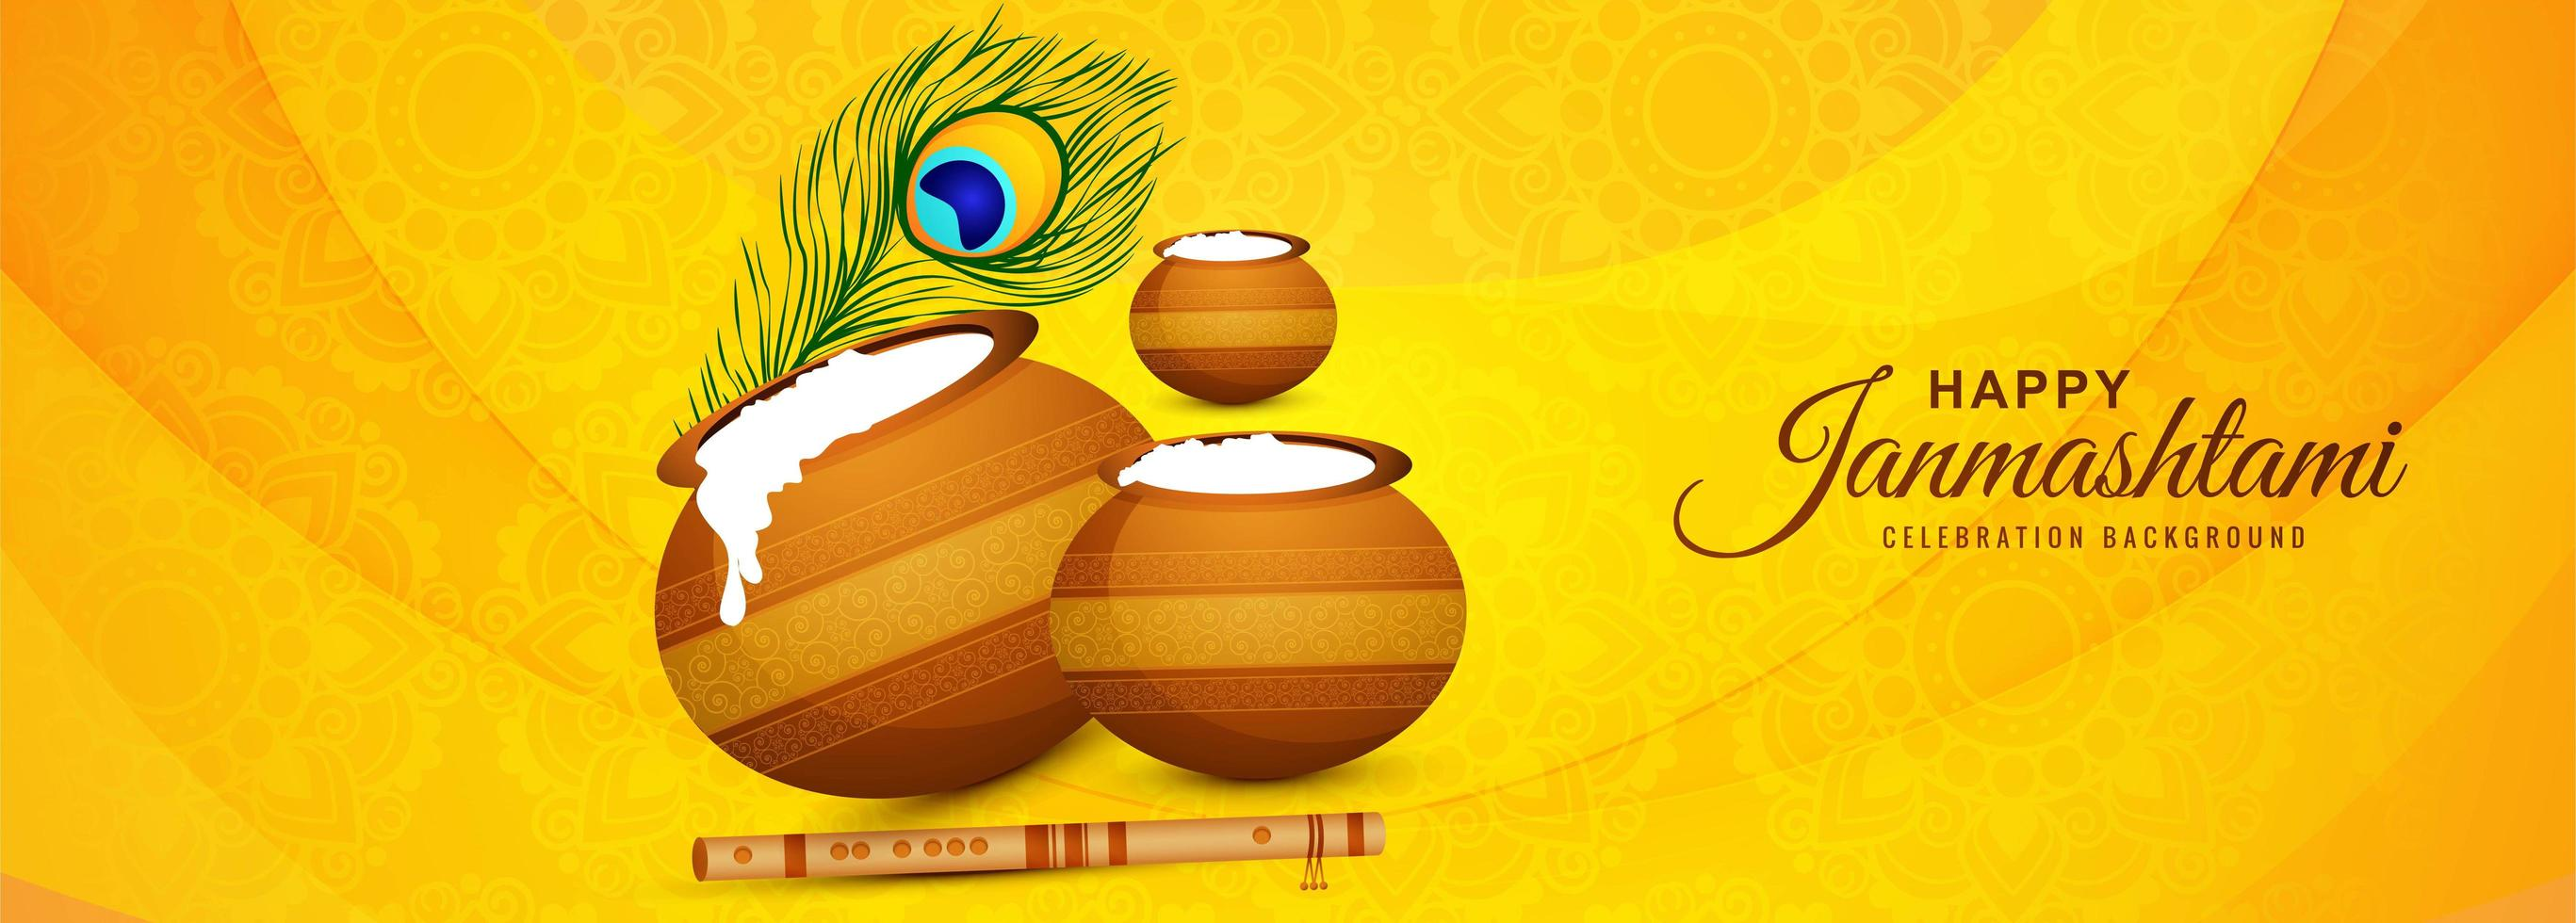 glad janmashtami med krukor gratulationskort banner på gult vektor